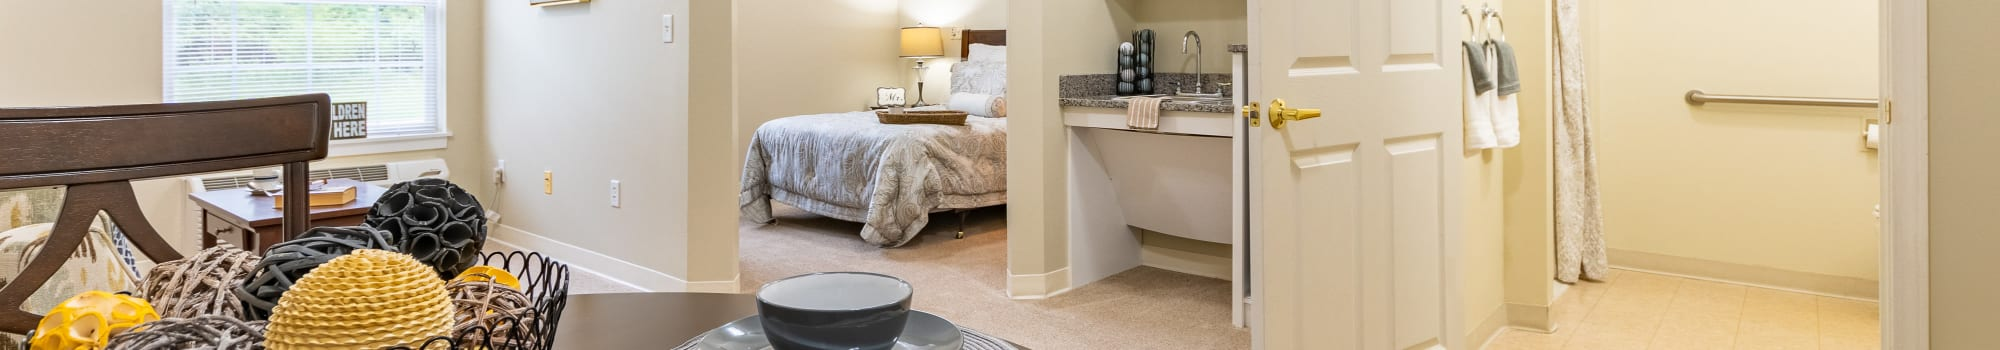 Senior living options in Kentwood, MI